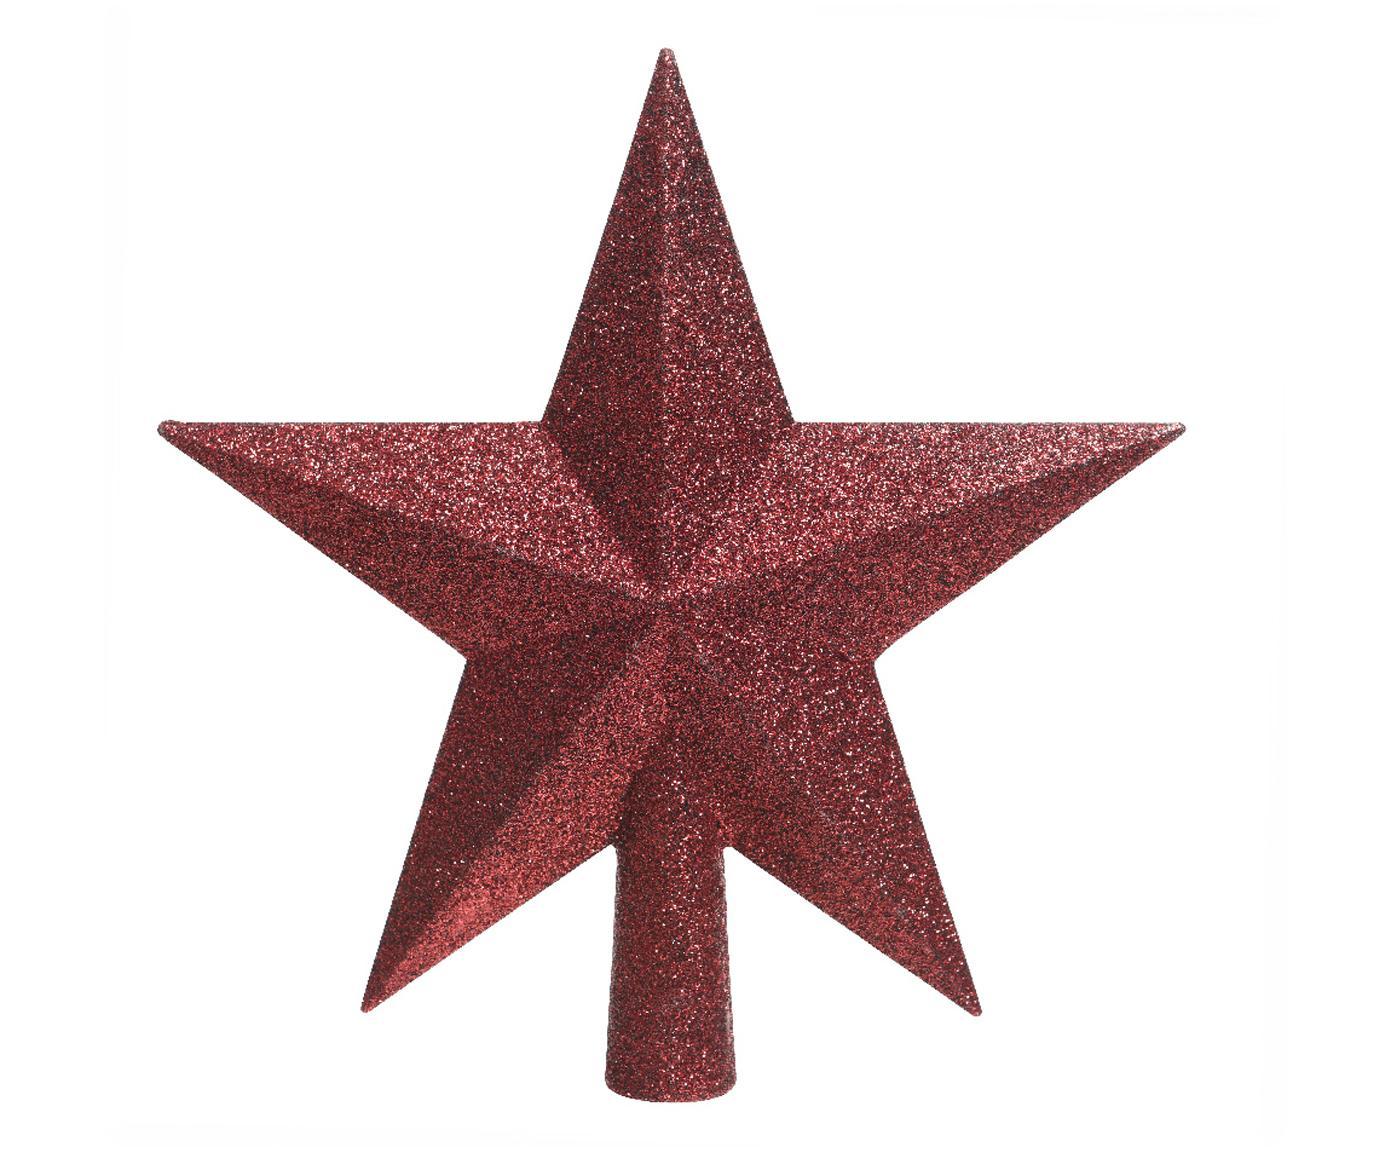 Piek Star, Kunststof, glitter, Rood, 19 x 19 cm